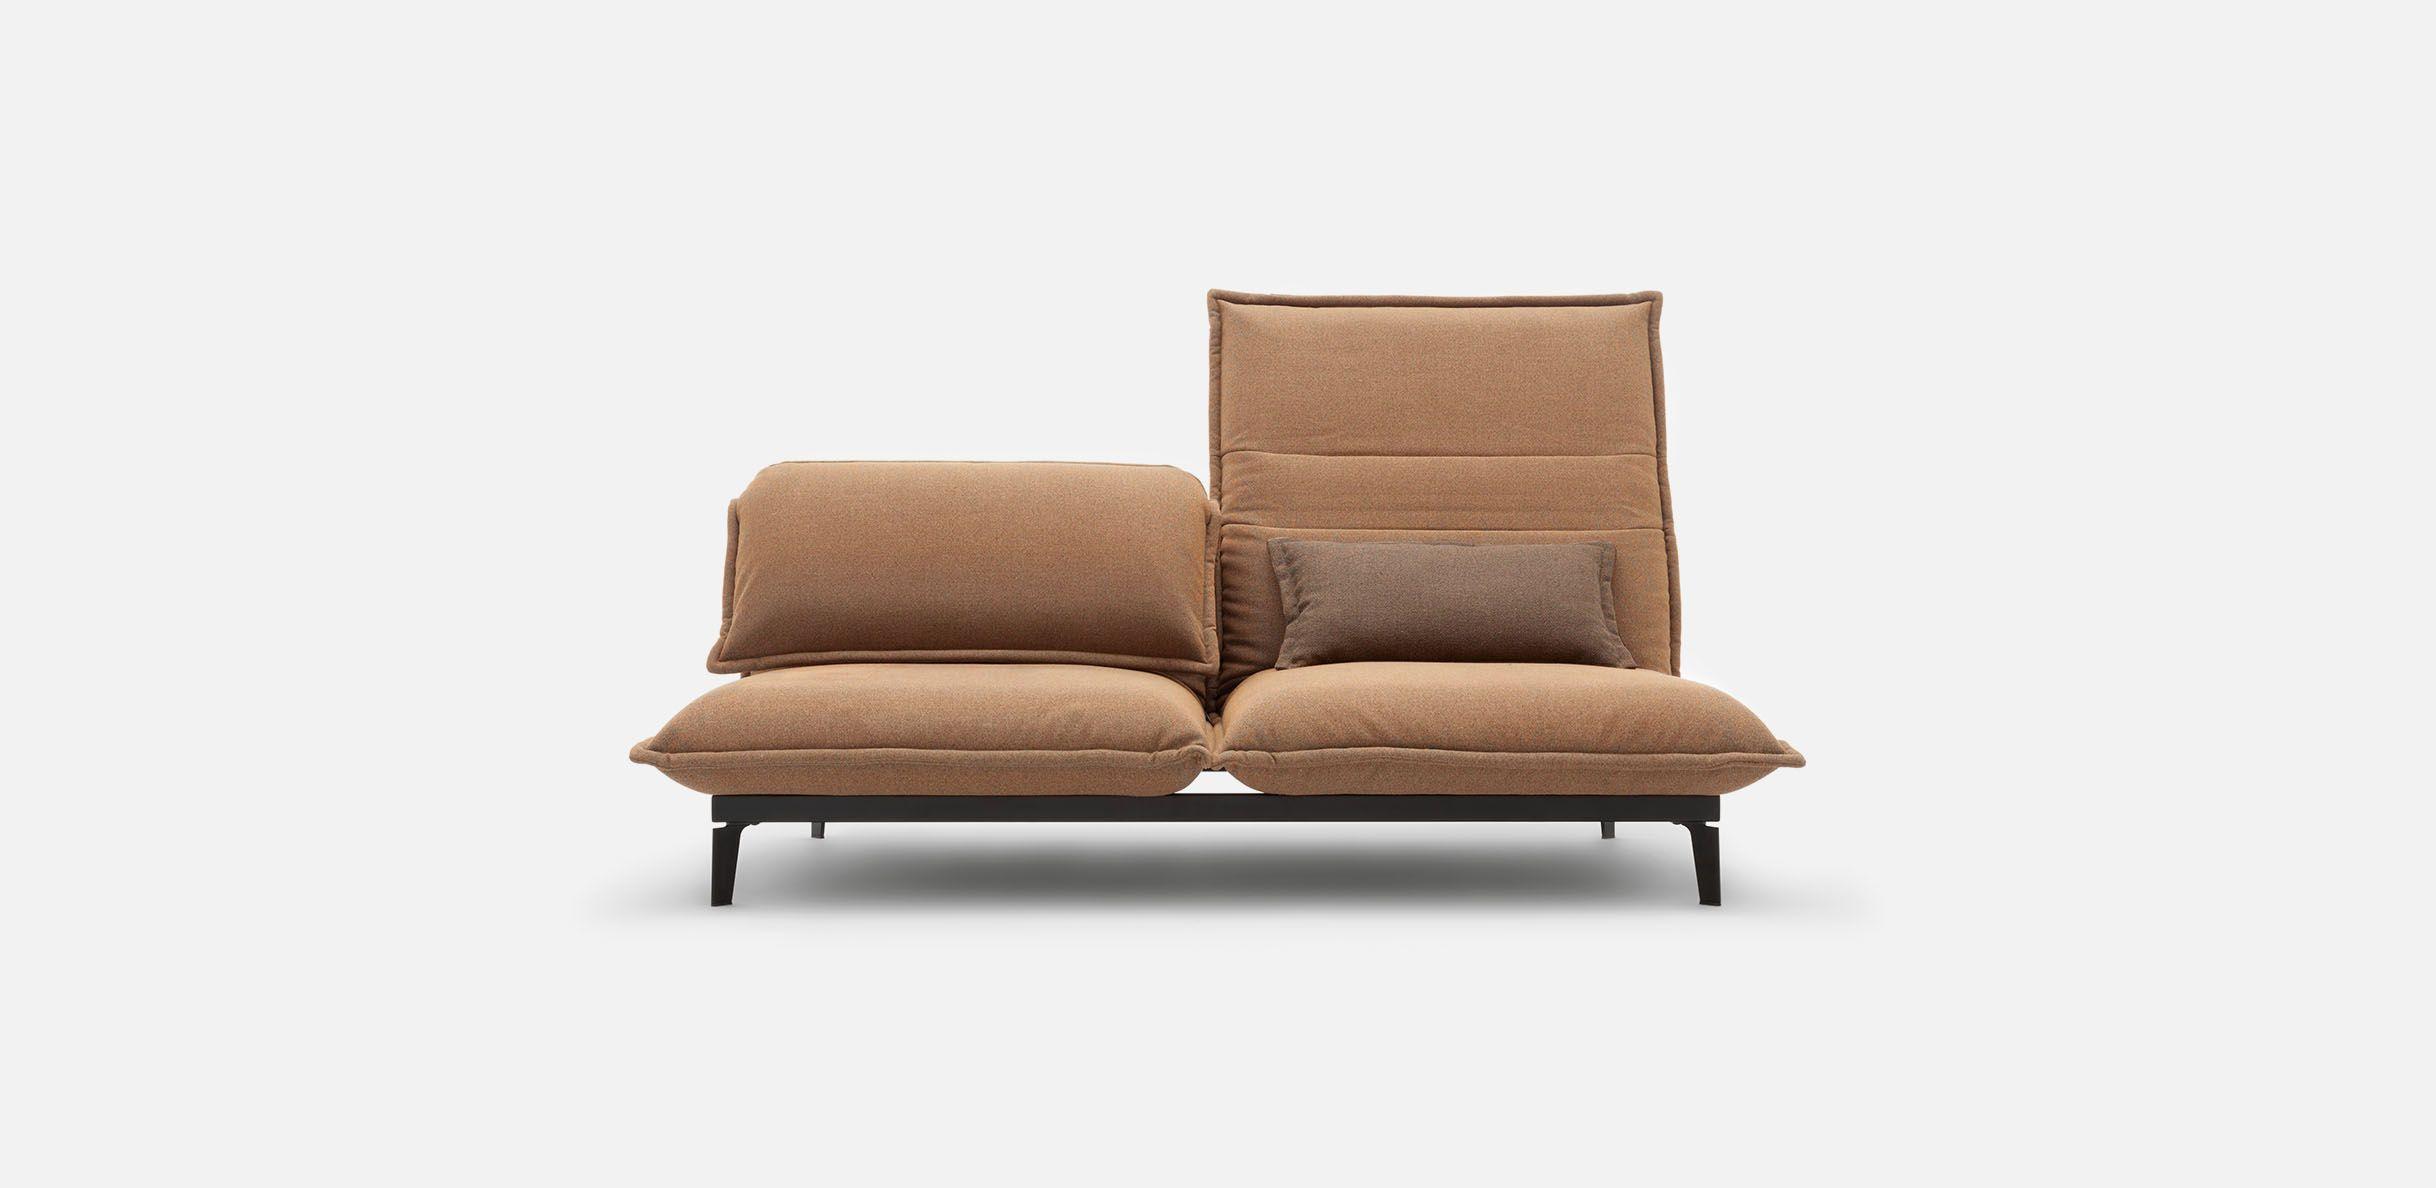 Rolf Benz Nova Broadway Penthouse Sofa Furniture Flexible